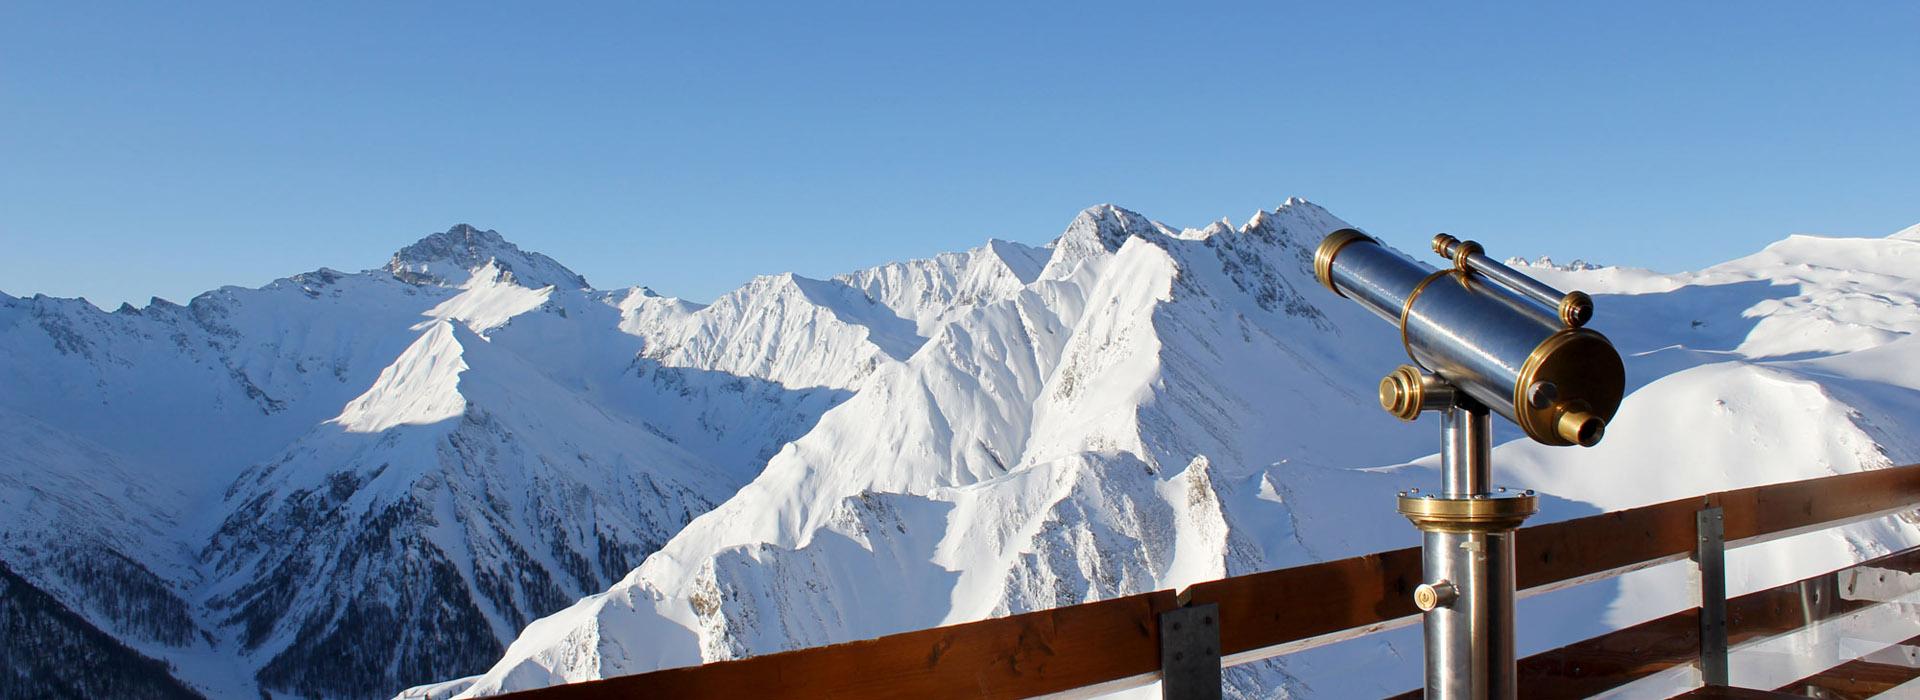 Winterwunderland Samnaun